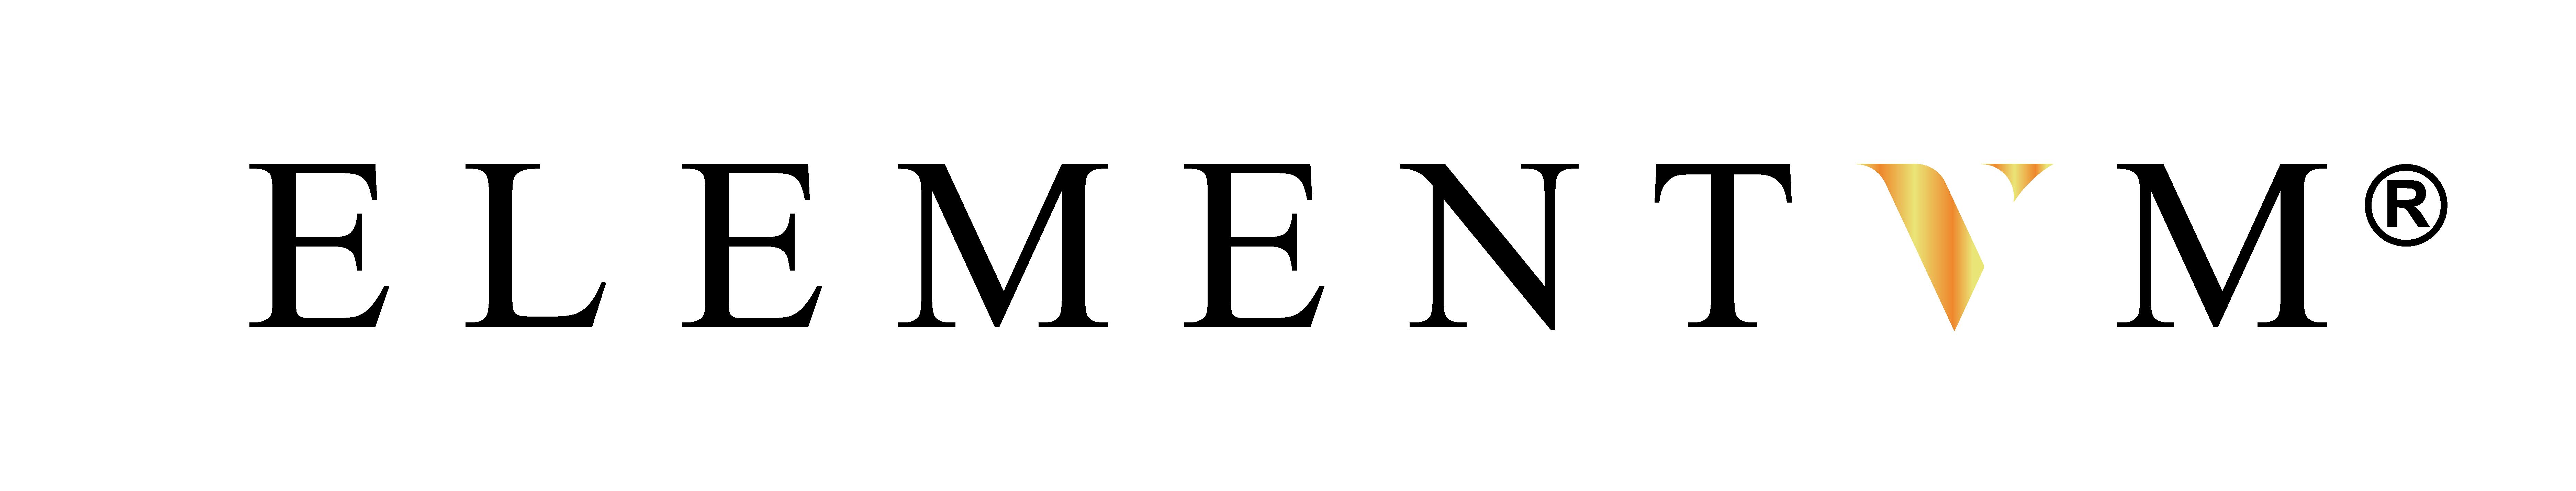 Elementvm®